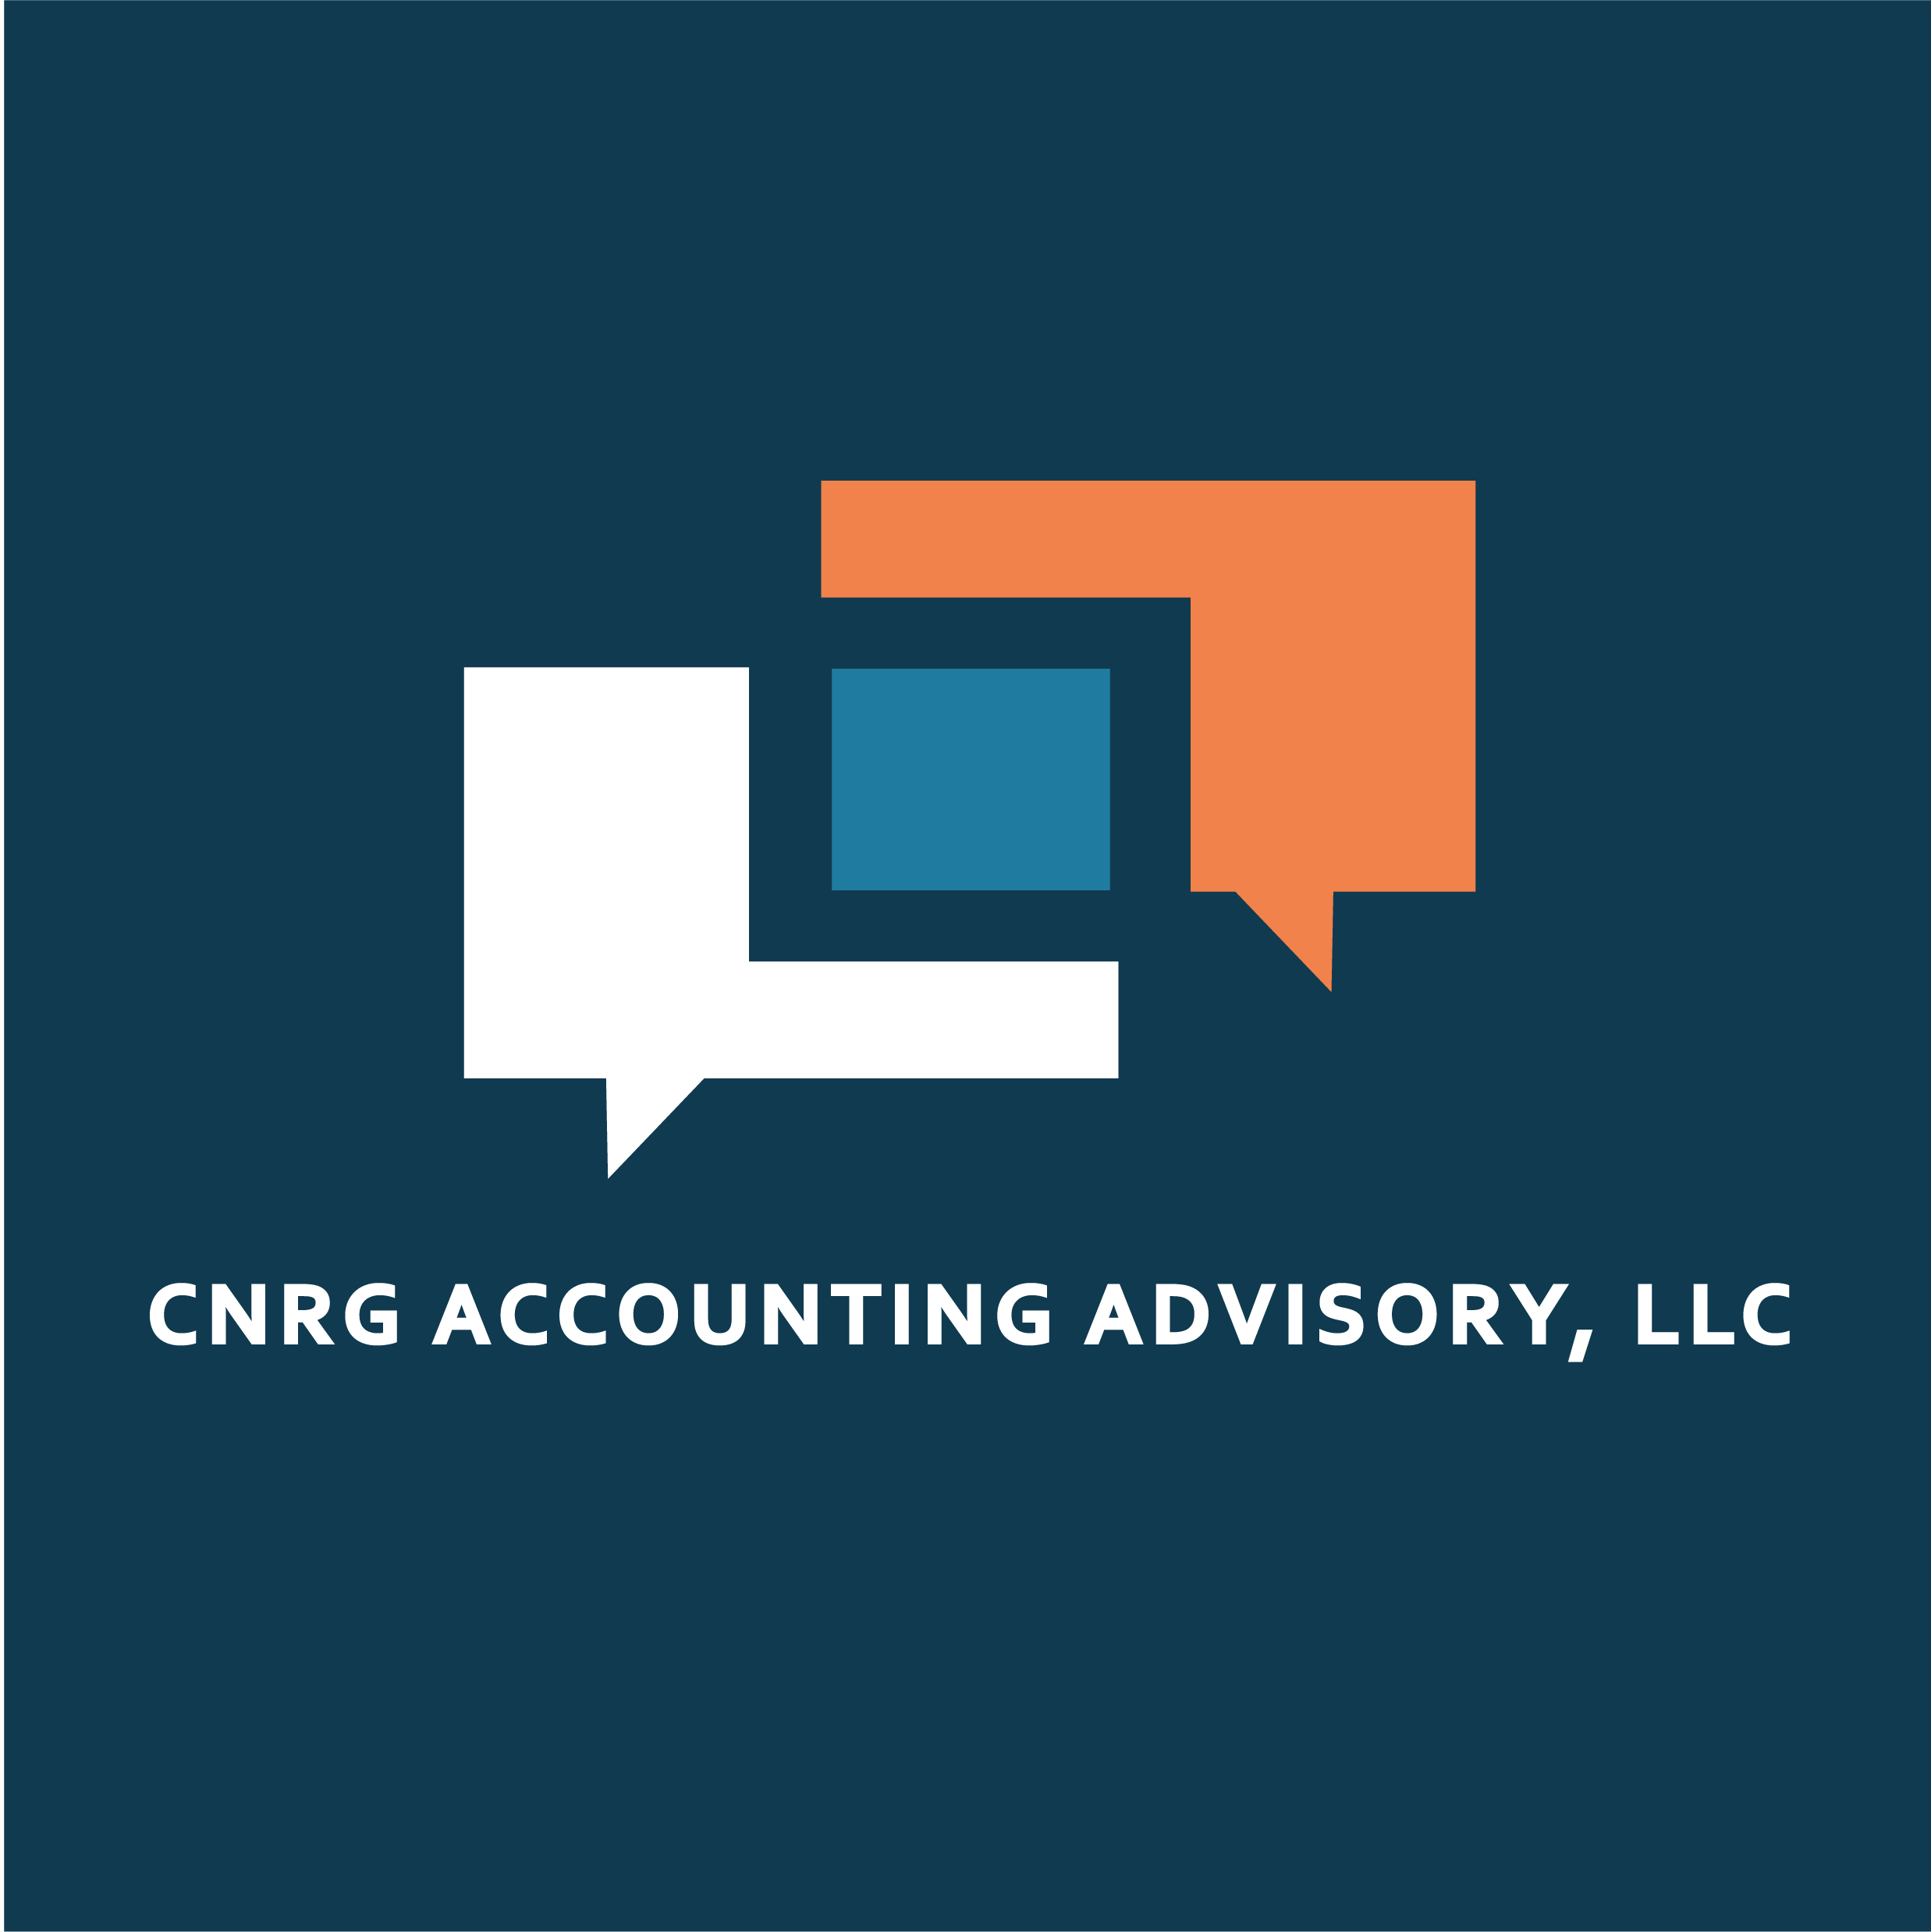 CNRG Accounting Advisory, LLC